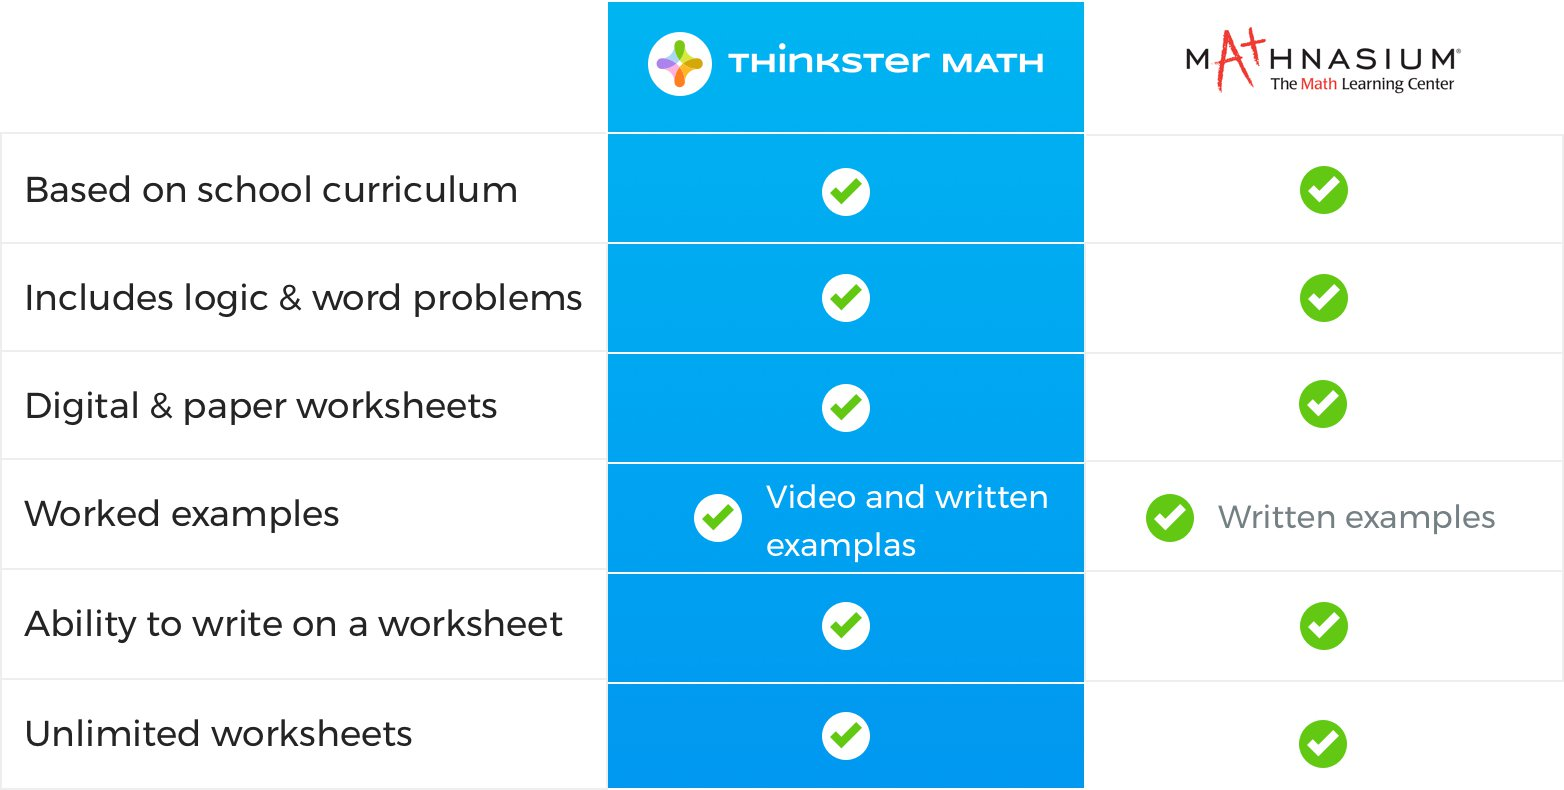 Mathnasium Worksheets vs. Thinkster Math Worksheets